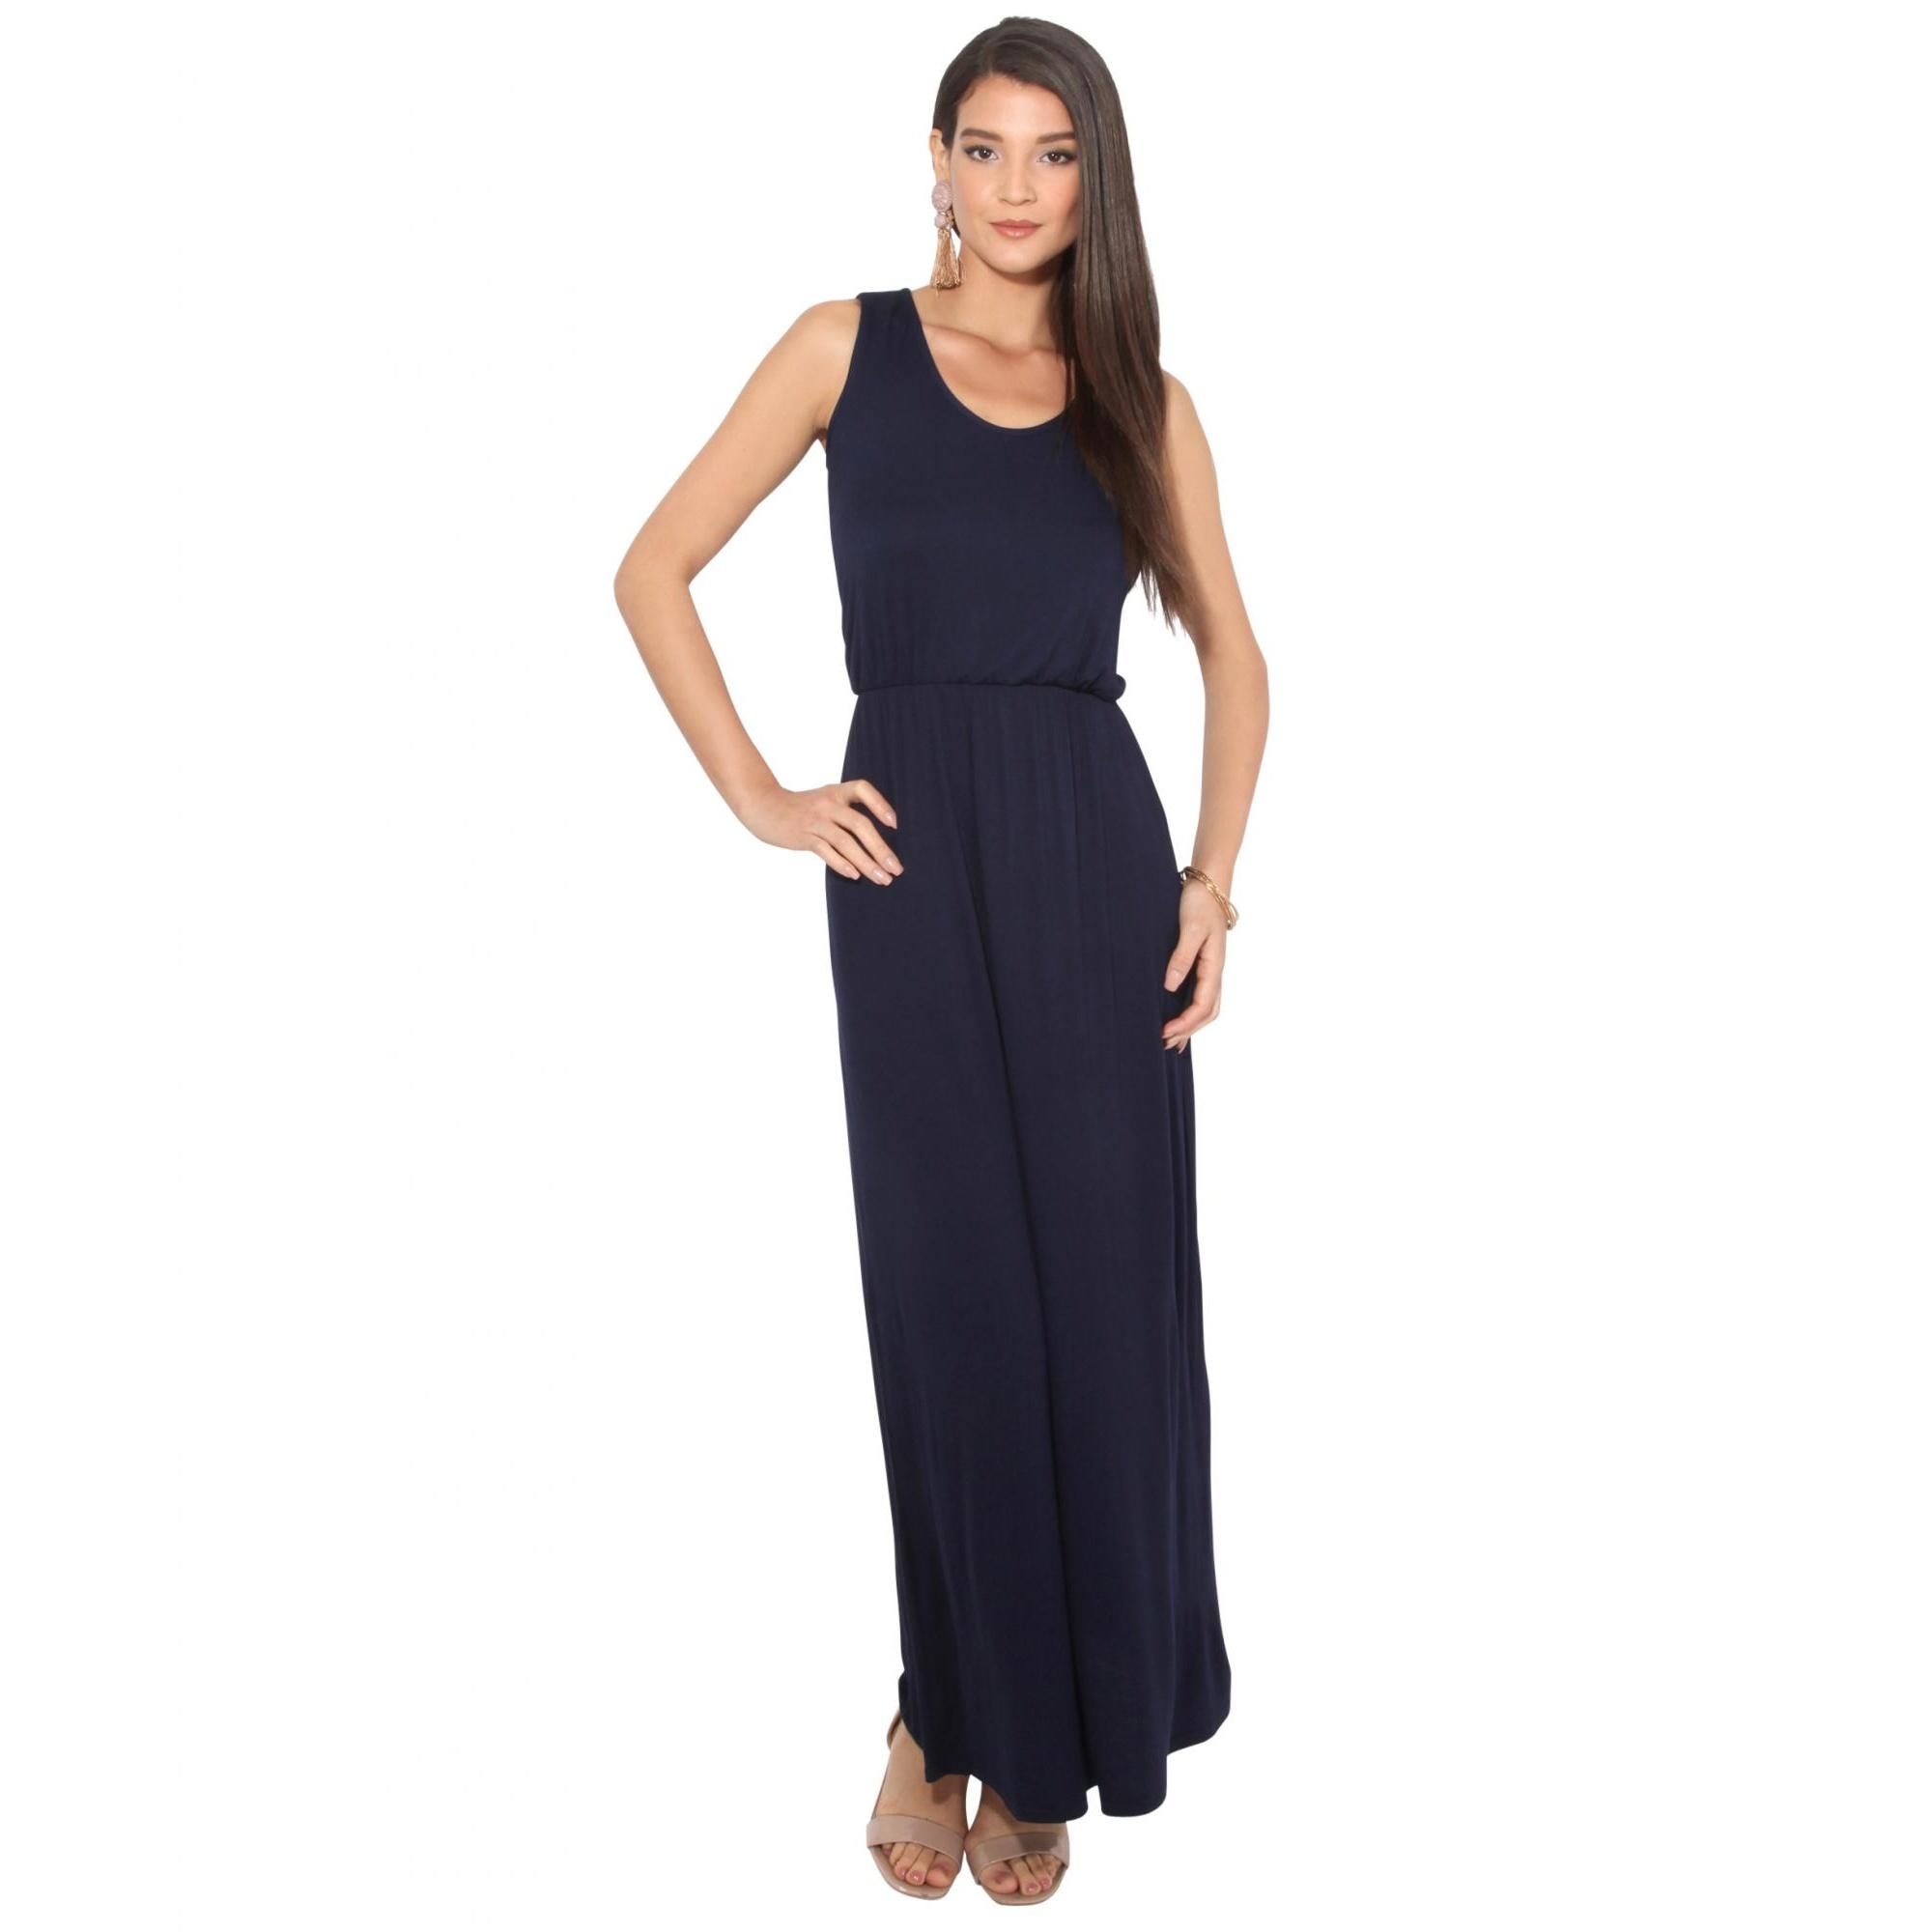 Krisp Womens/Ladies Shirred Sleeveless Maxi Dress (20 UK) (Navy)